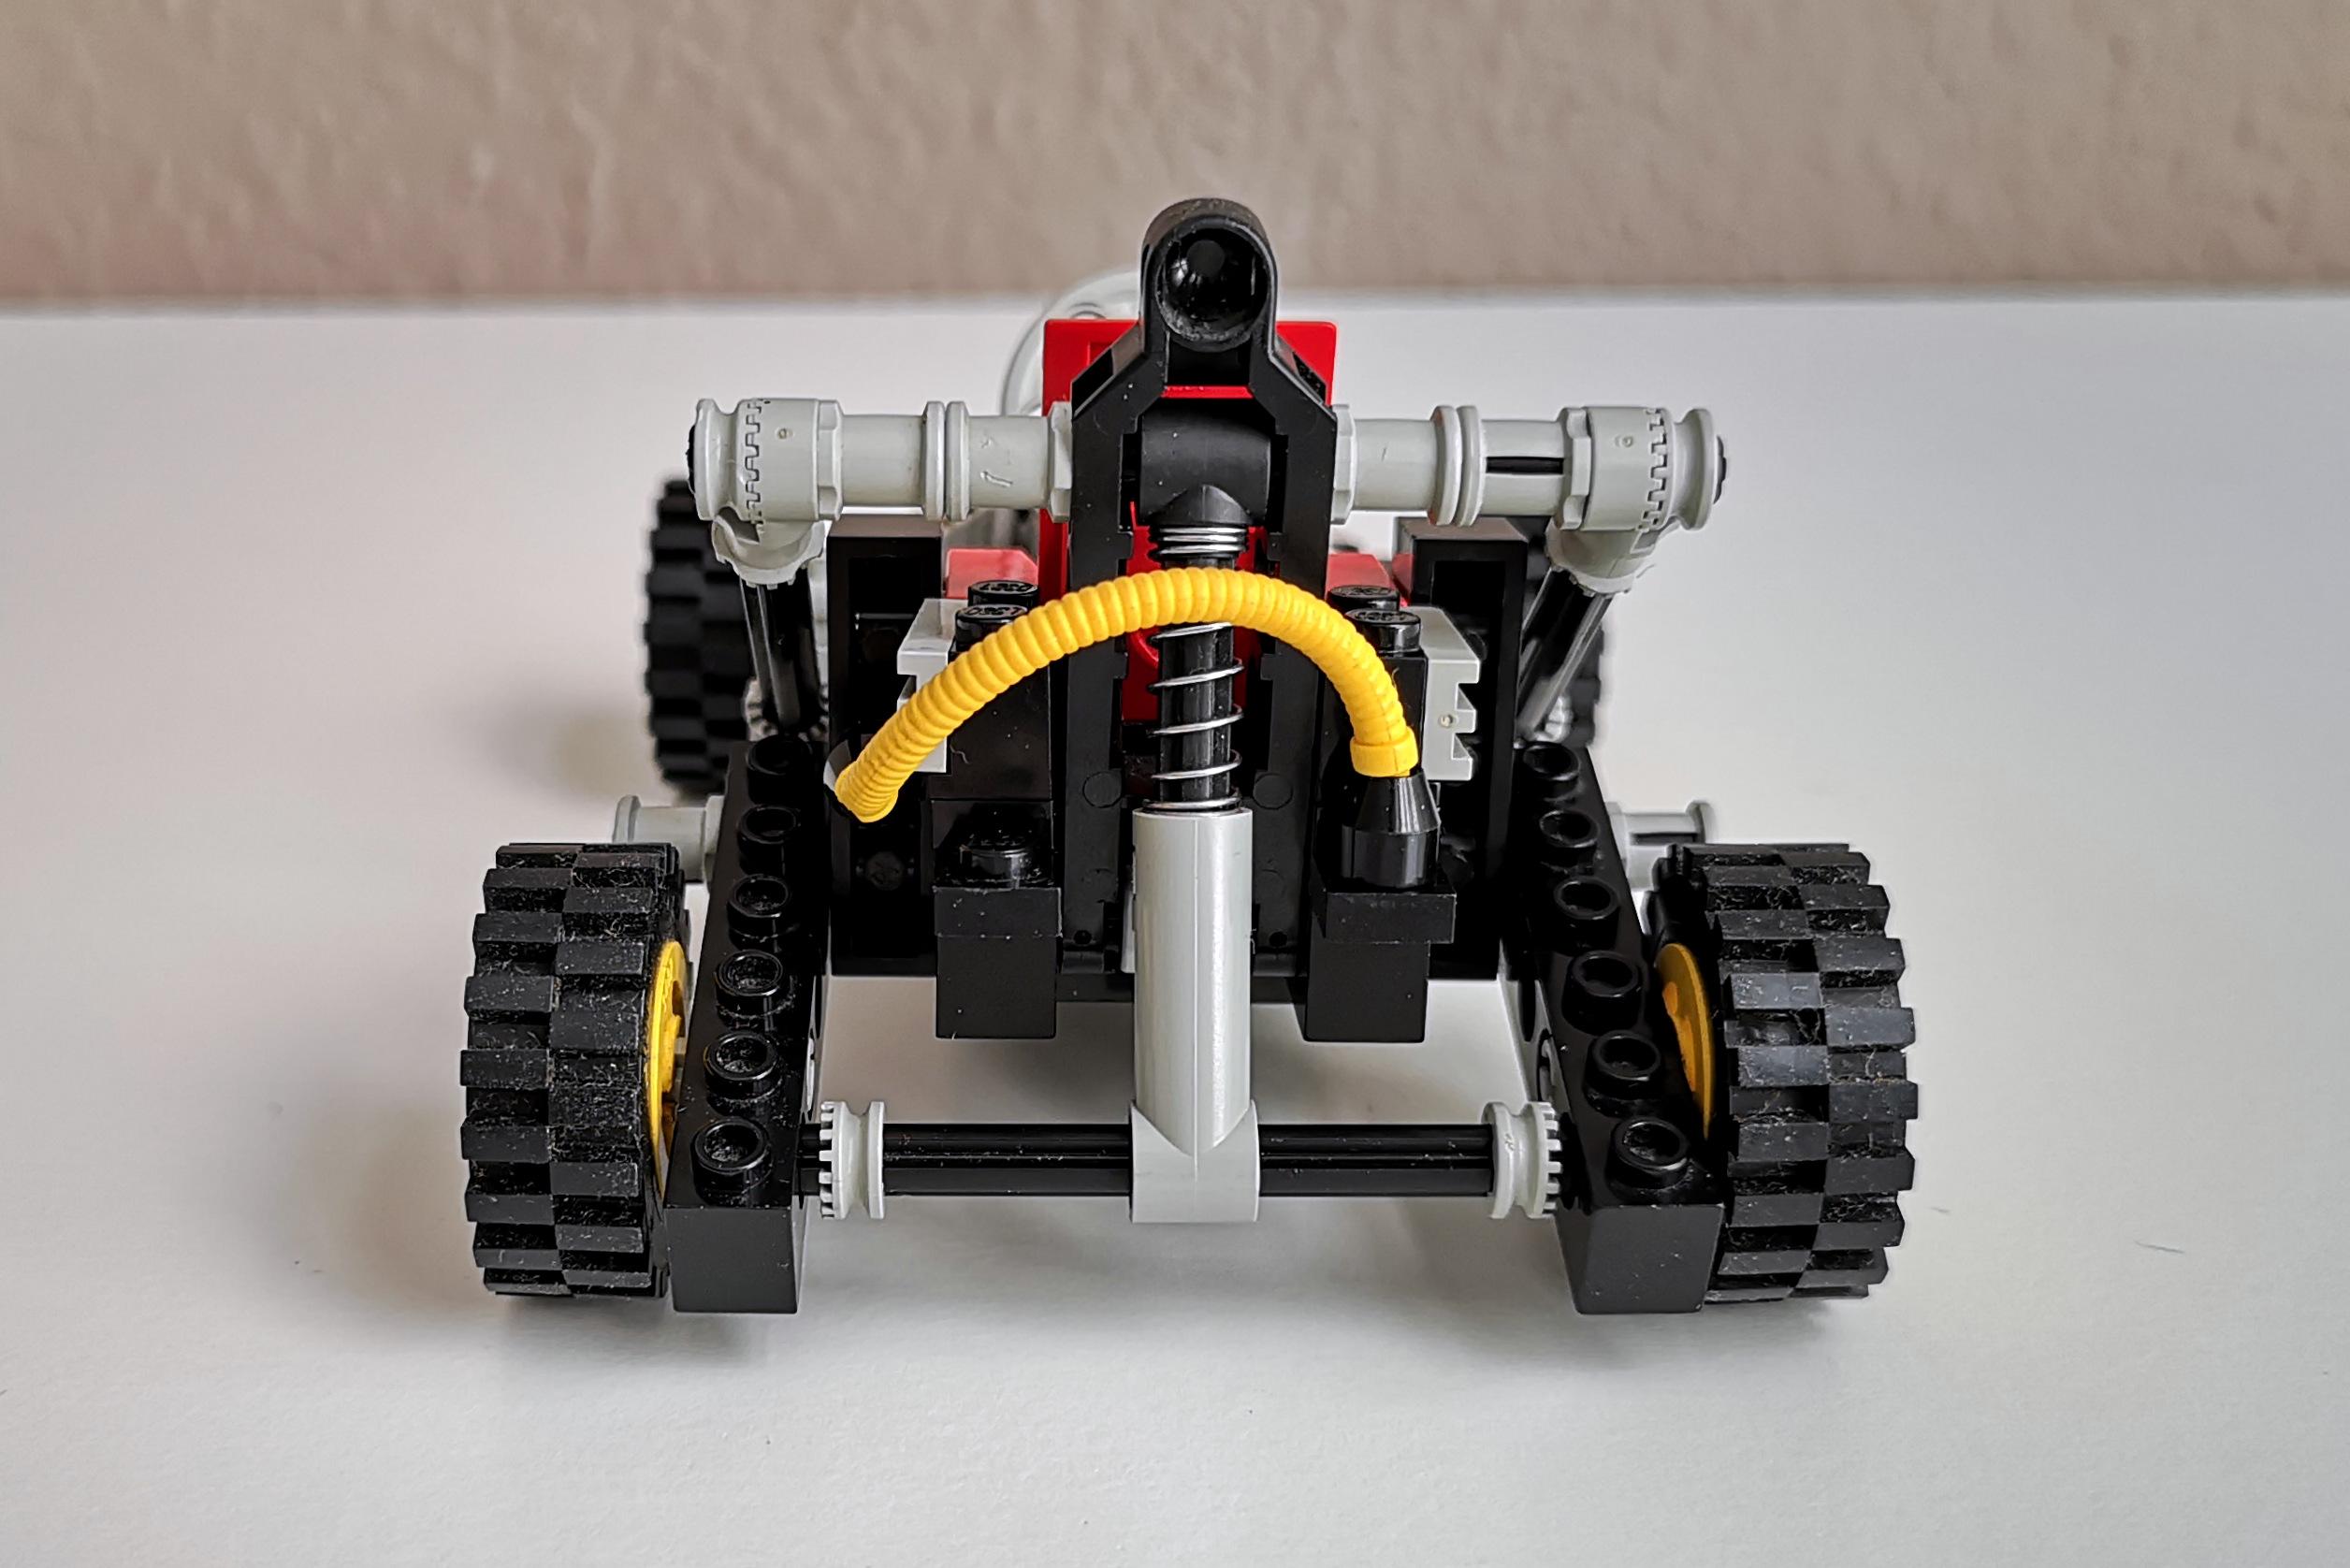 LEGO Set 8832 Modell A Rückseite mit Federung